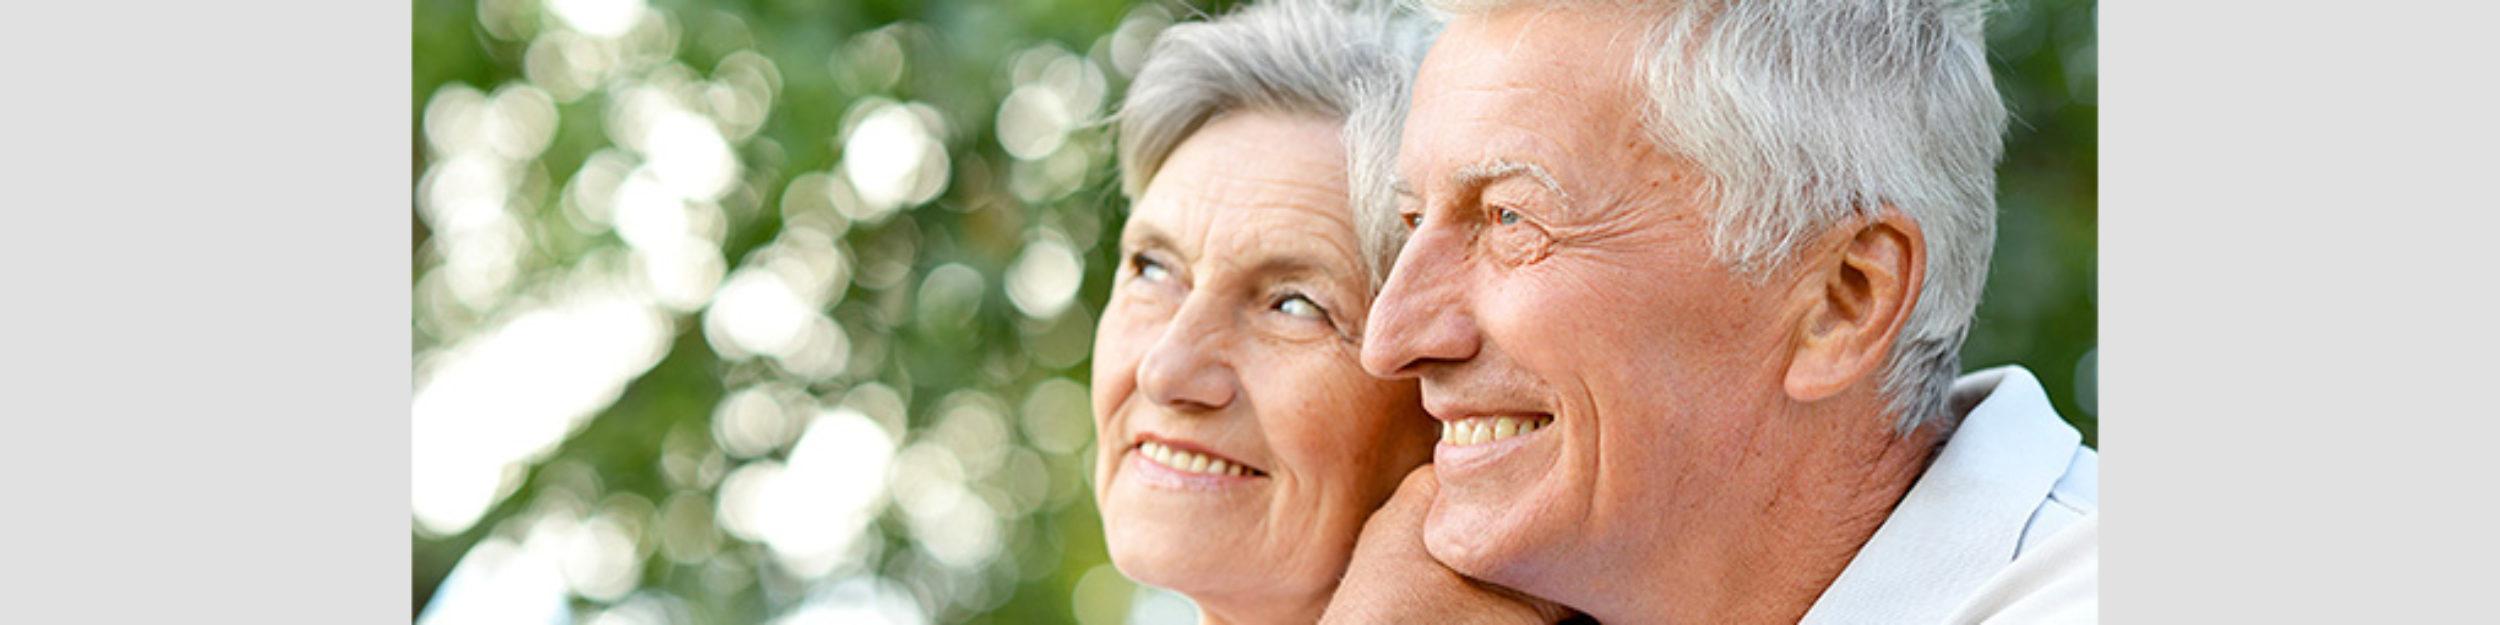 Open Care Seniors